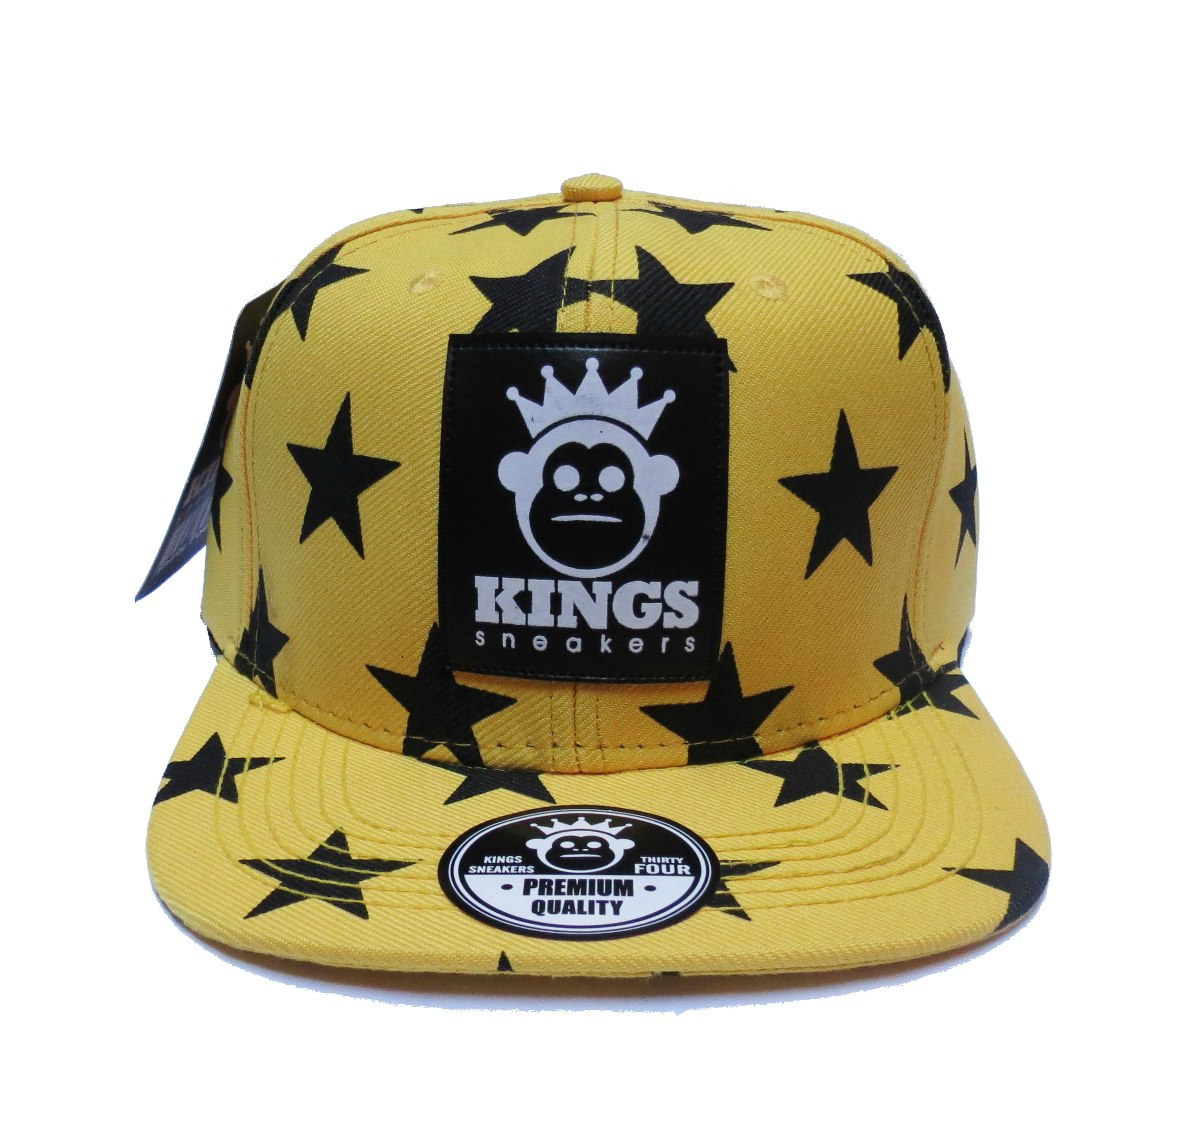 boné aba reta snapback kings sneakers stars estrela. Carregando zoom. 3b51ede1d7e